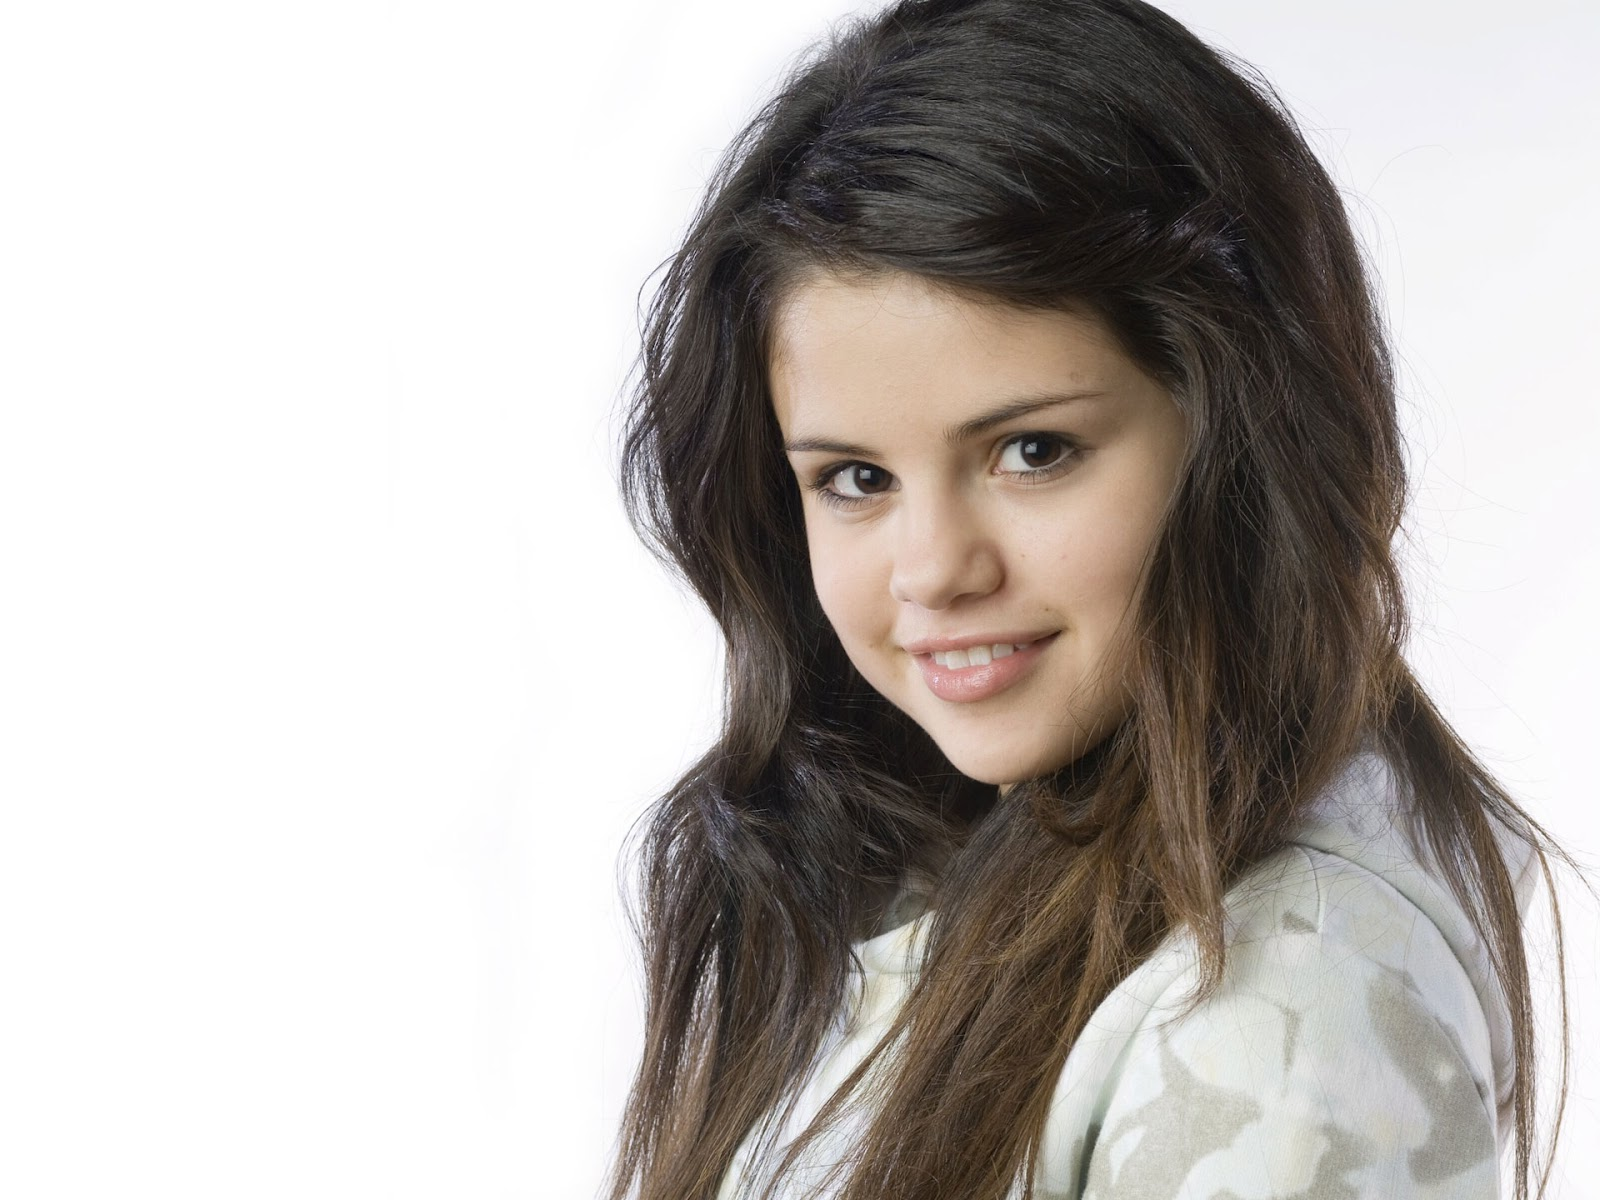 Cute Photos Hd Wallpaper Best Pics Store Selena Gomez Cute Hd Wallpaper Collection